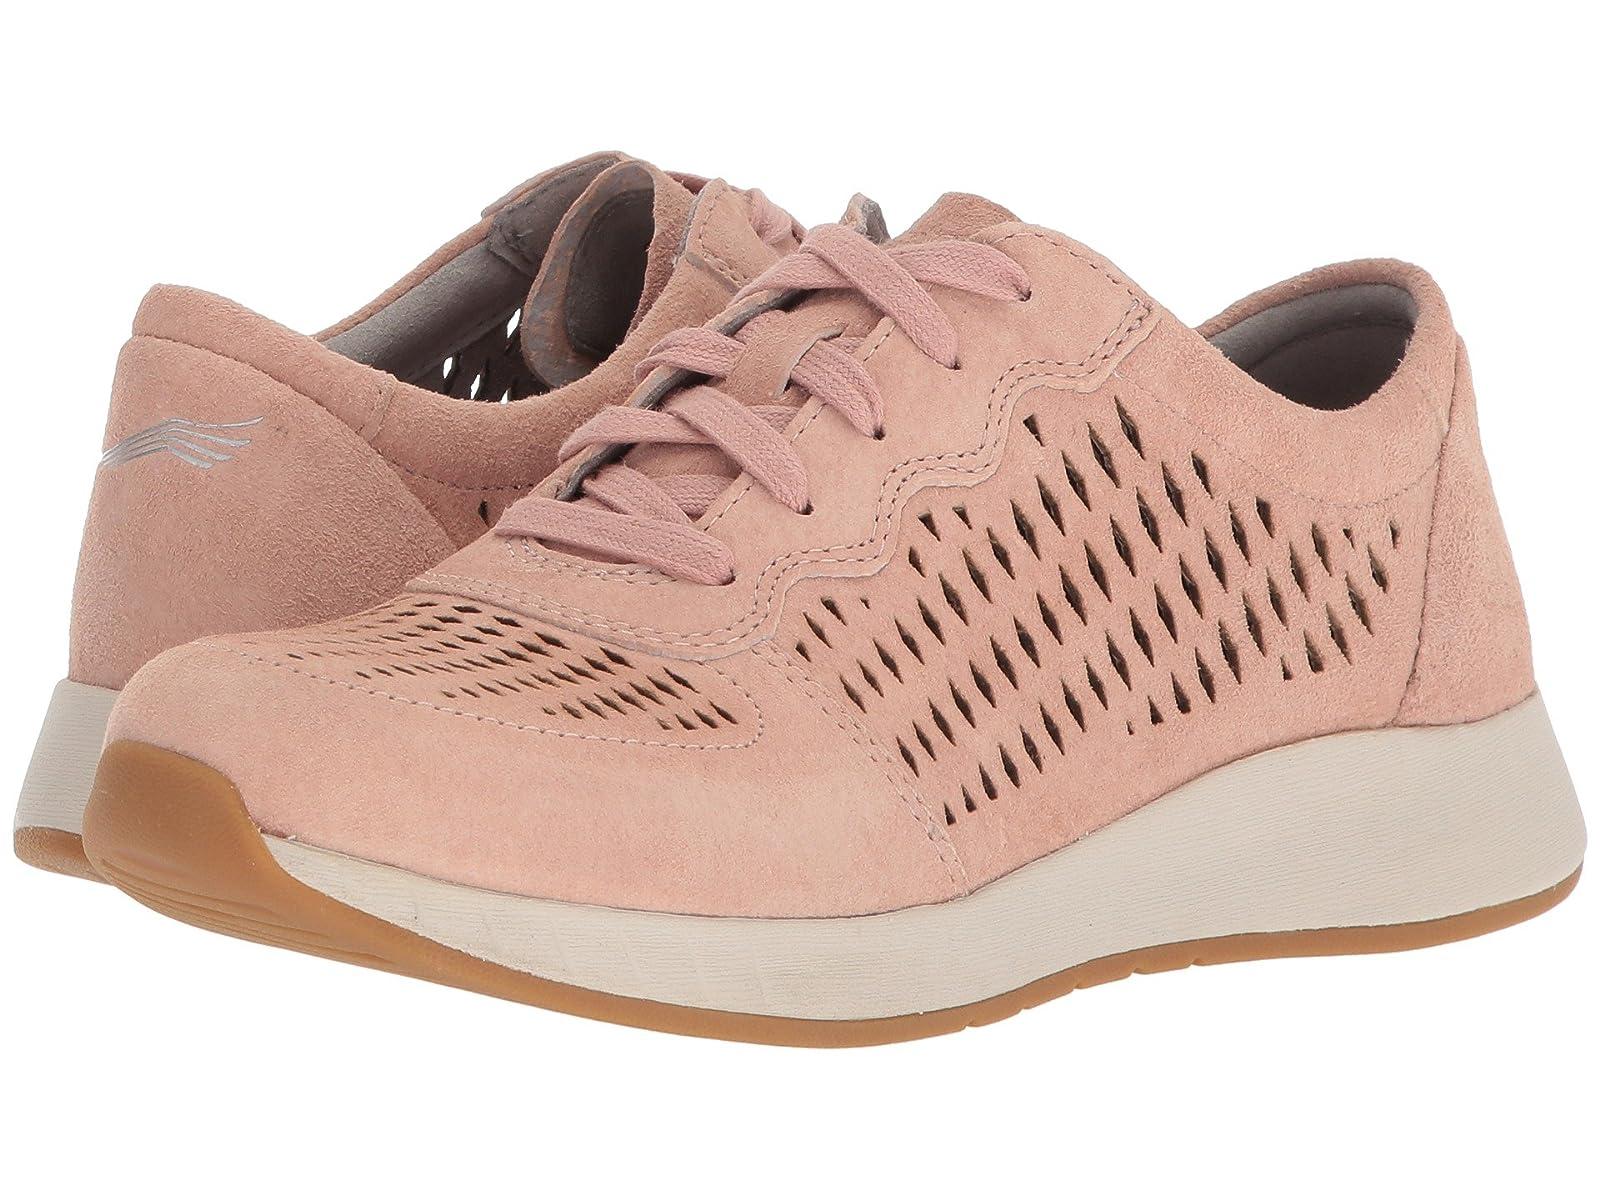 Dansko CharlieCheap and distinctive eye-catching shoes